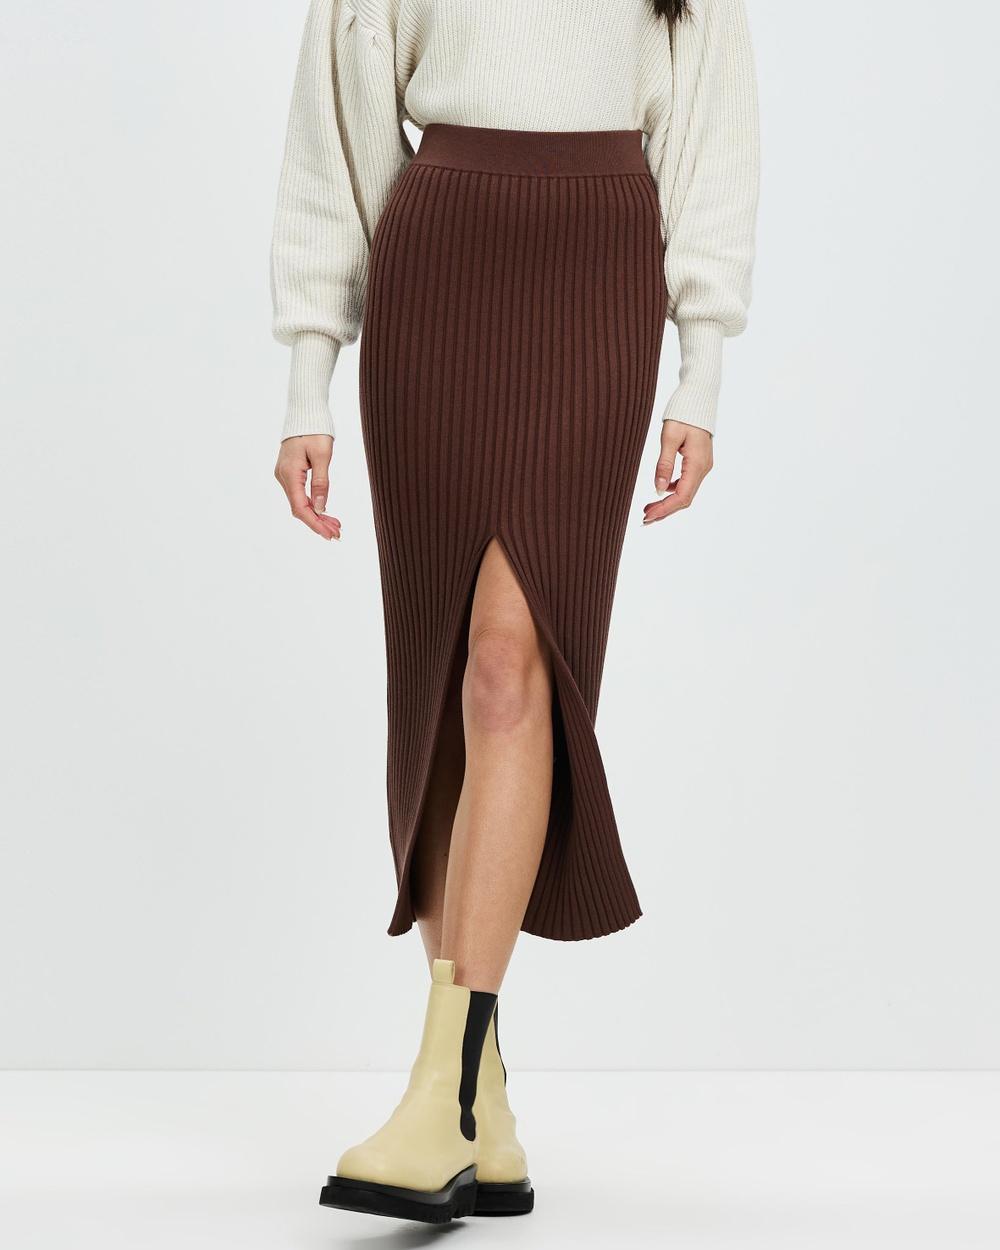 AERE Organic Cotton Blend Ribbed Skirt Pencil skirts Chocolate